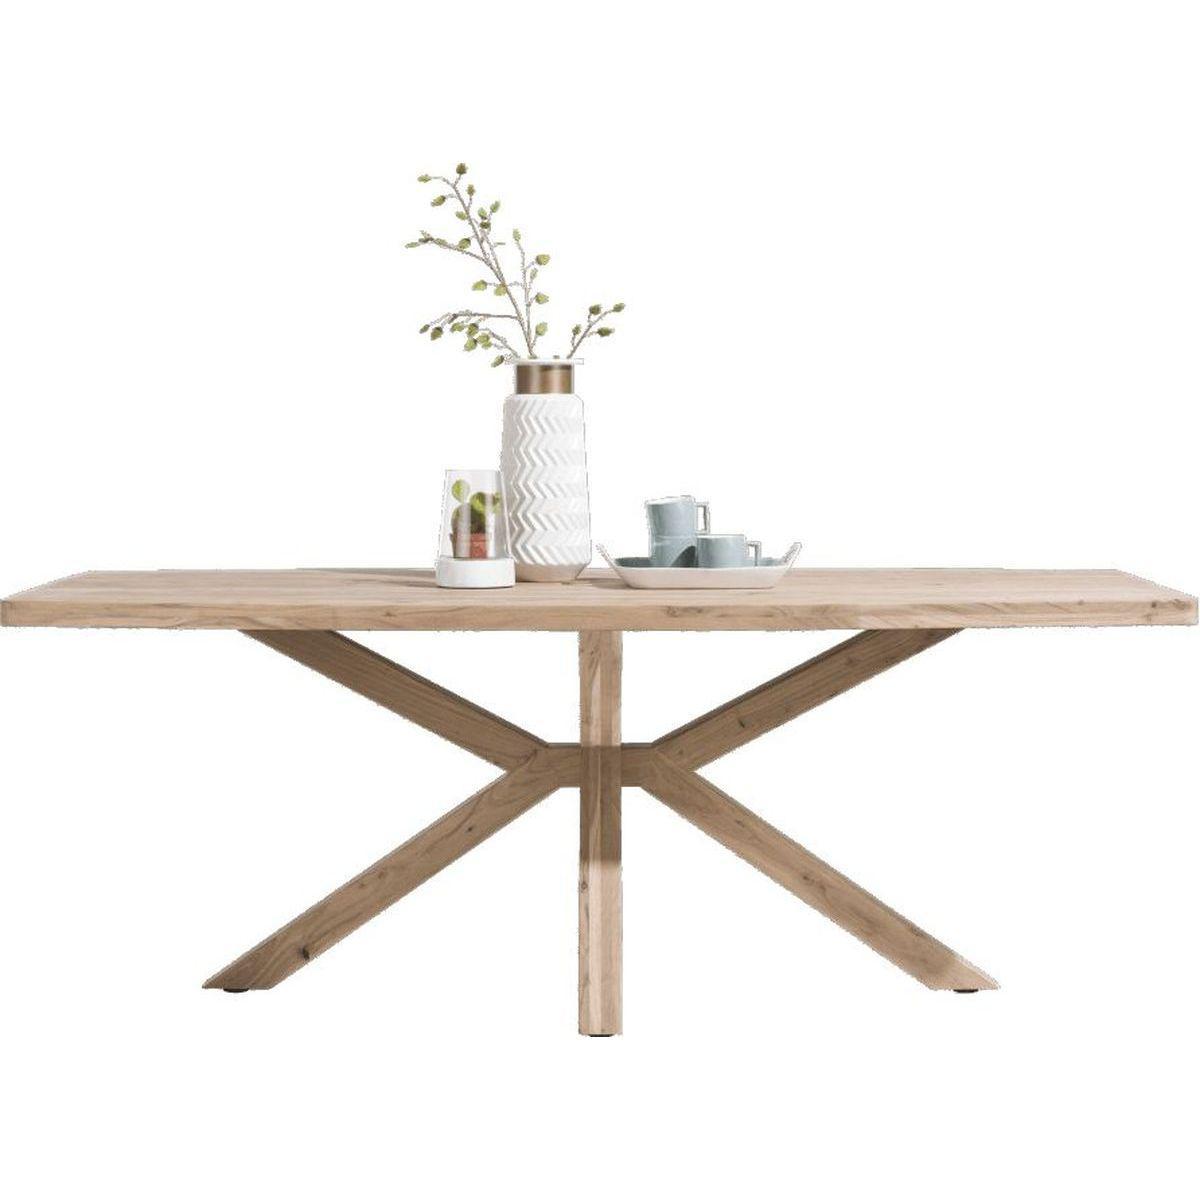 Table QUEBEC Henders & Hazel 240x110cm pieds en bois